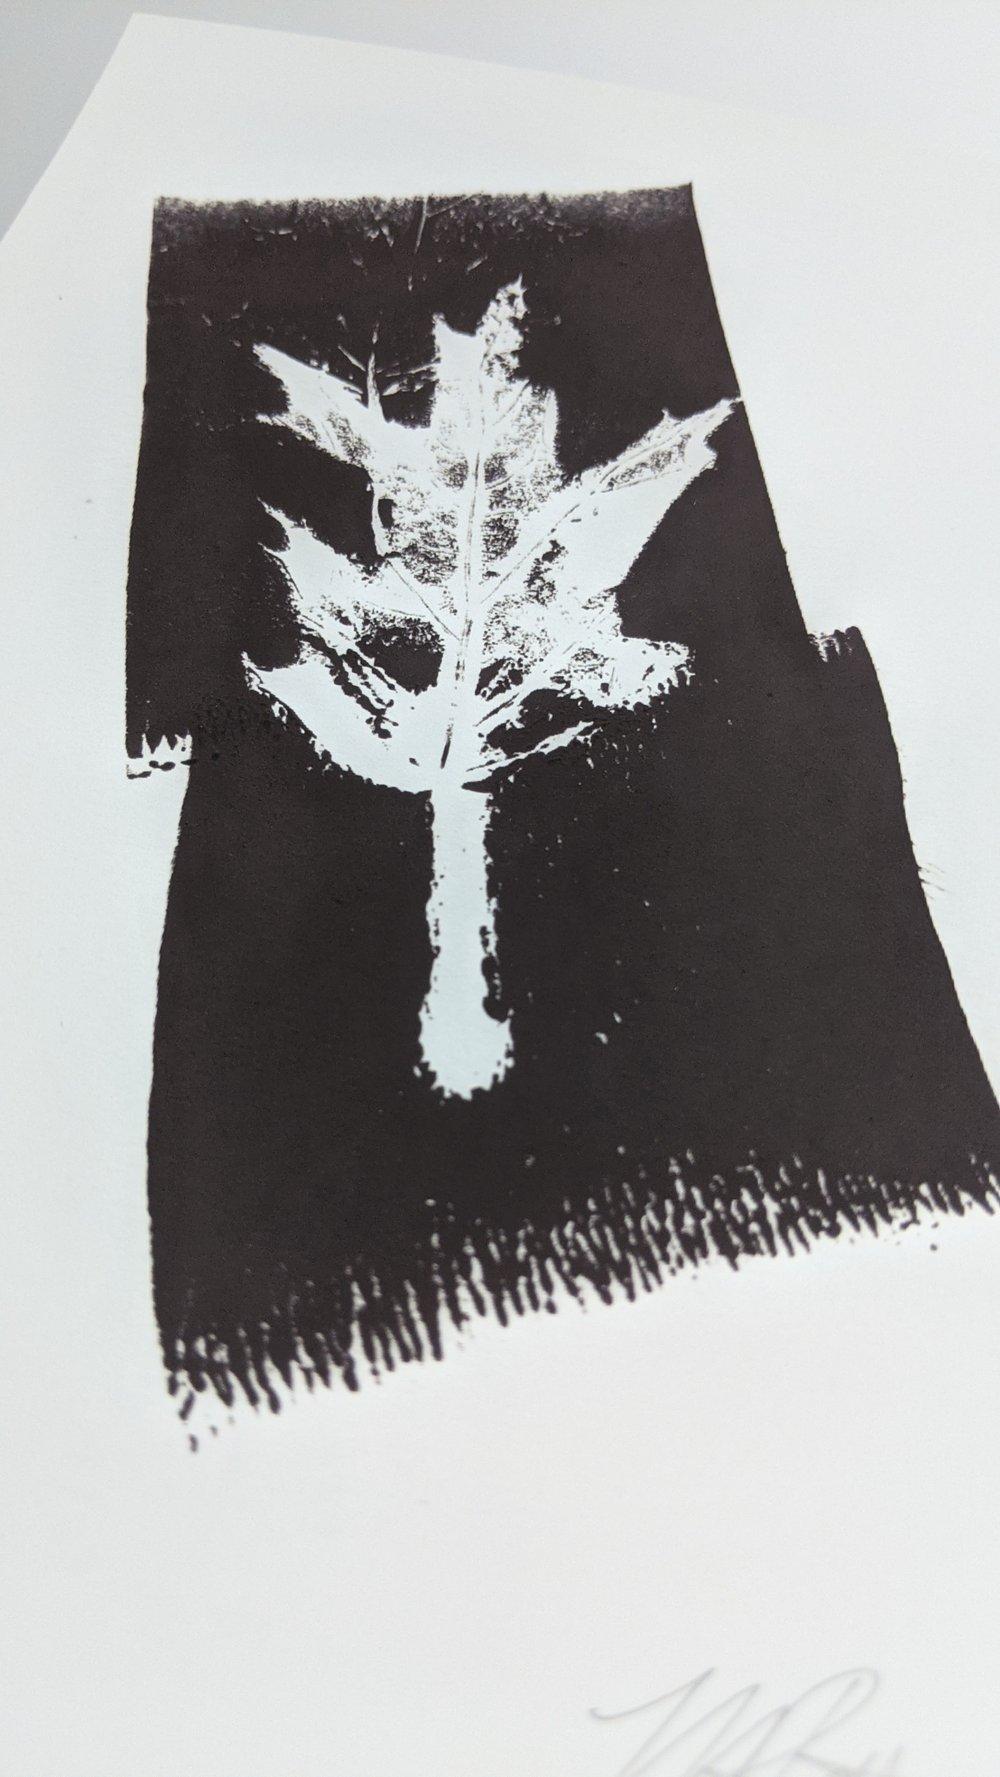 """Renew"" - Our original Oak leaf block art print on recycled paper."